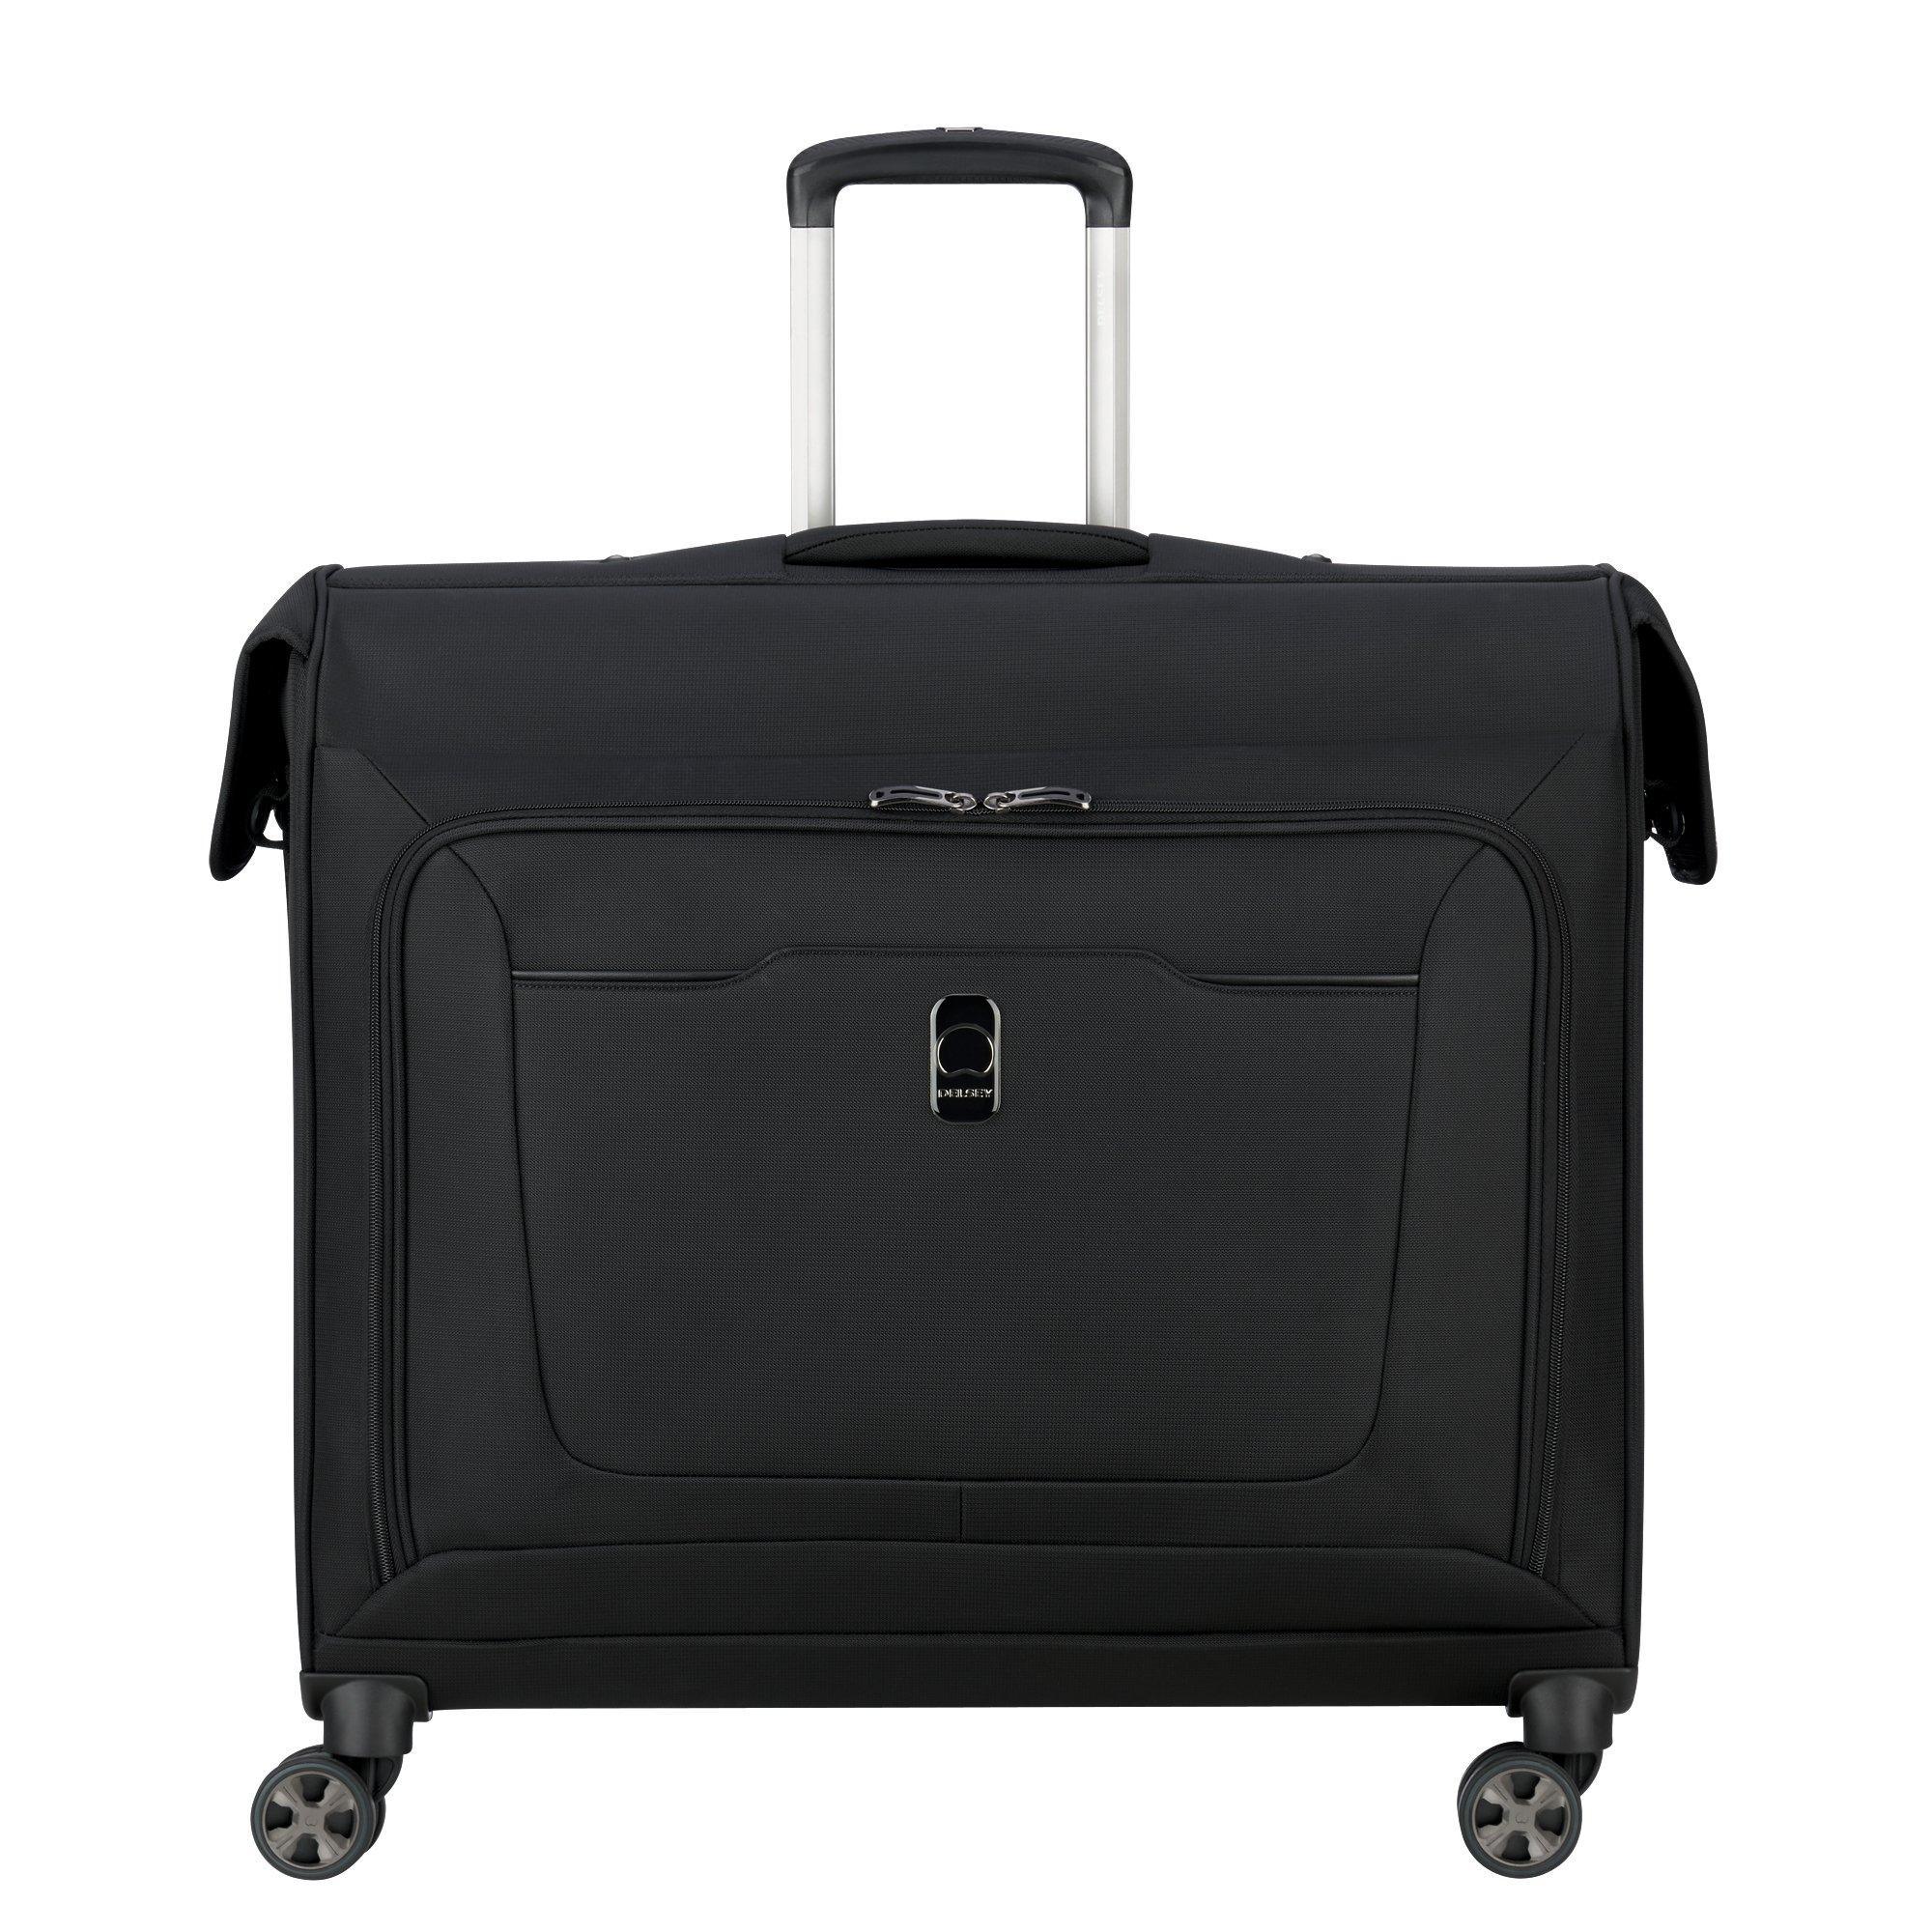 DELSEY Paris Hyperglide Spinner Garment Bag Suit or Dress, Black